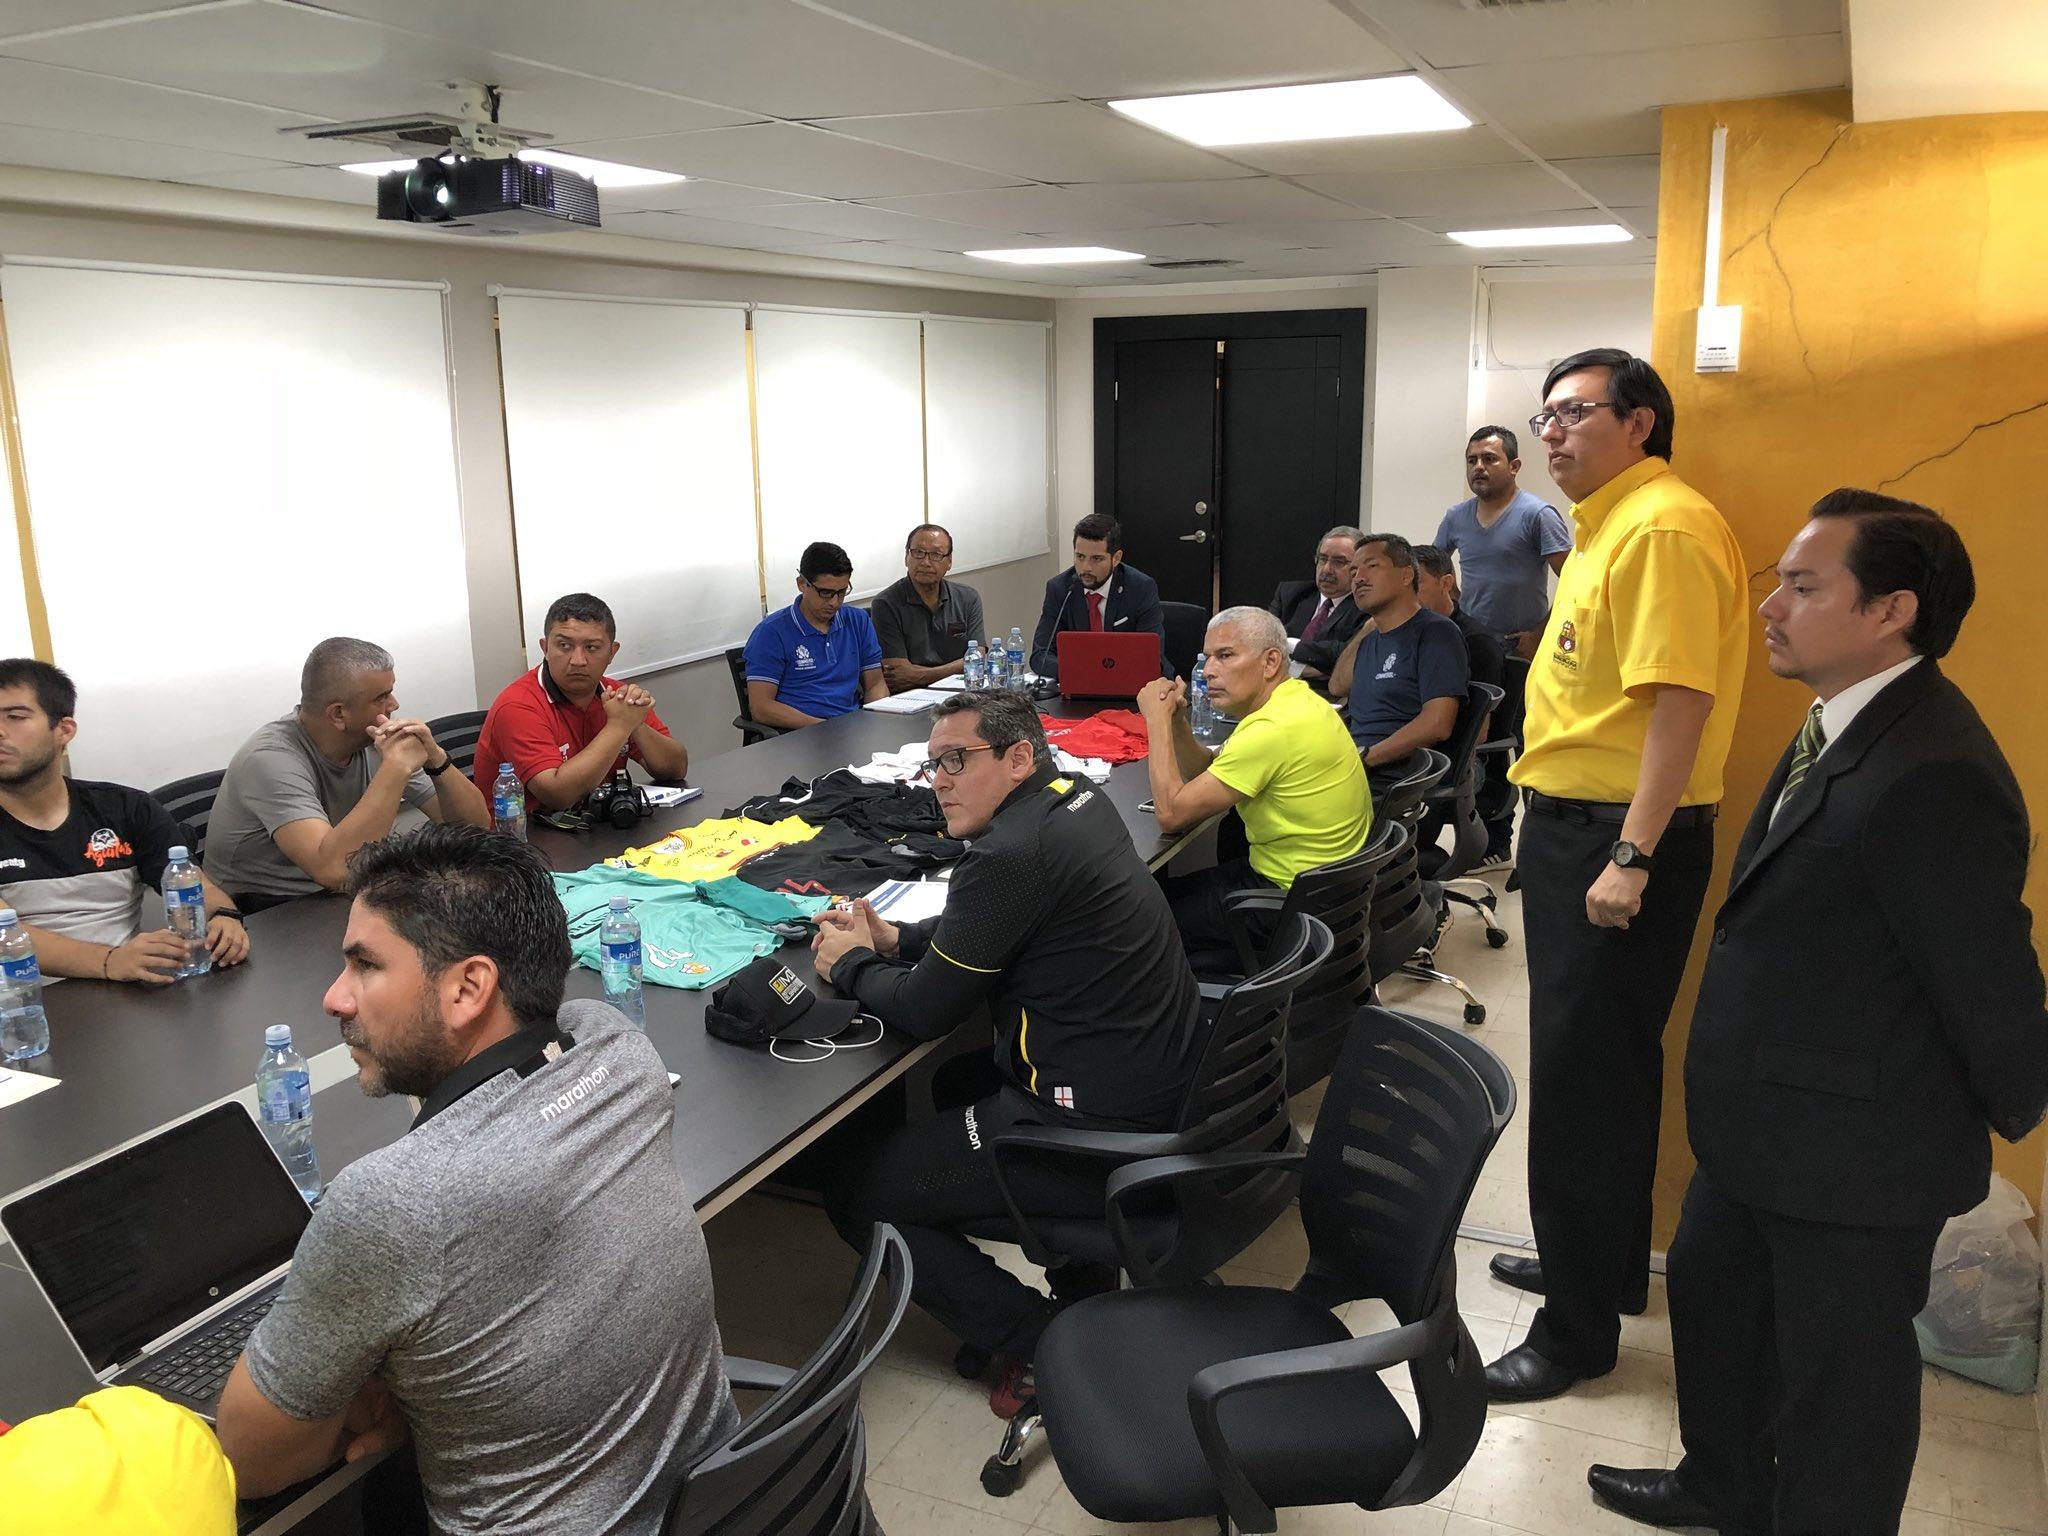 Reunión técnica #BSCvsGDI en Sala  de Reuniones del #MonumentalBcoPichincha  #CopaConmebolSudamericana https://t.co/X8udezK94g